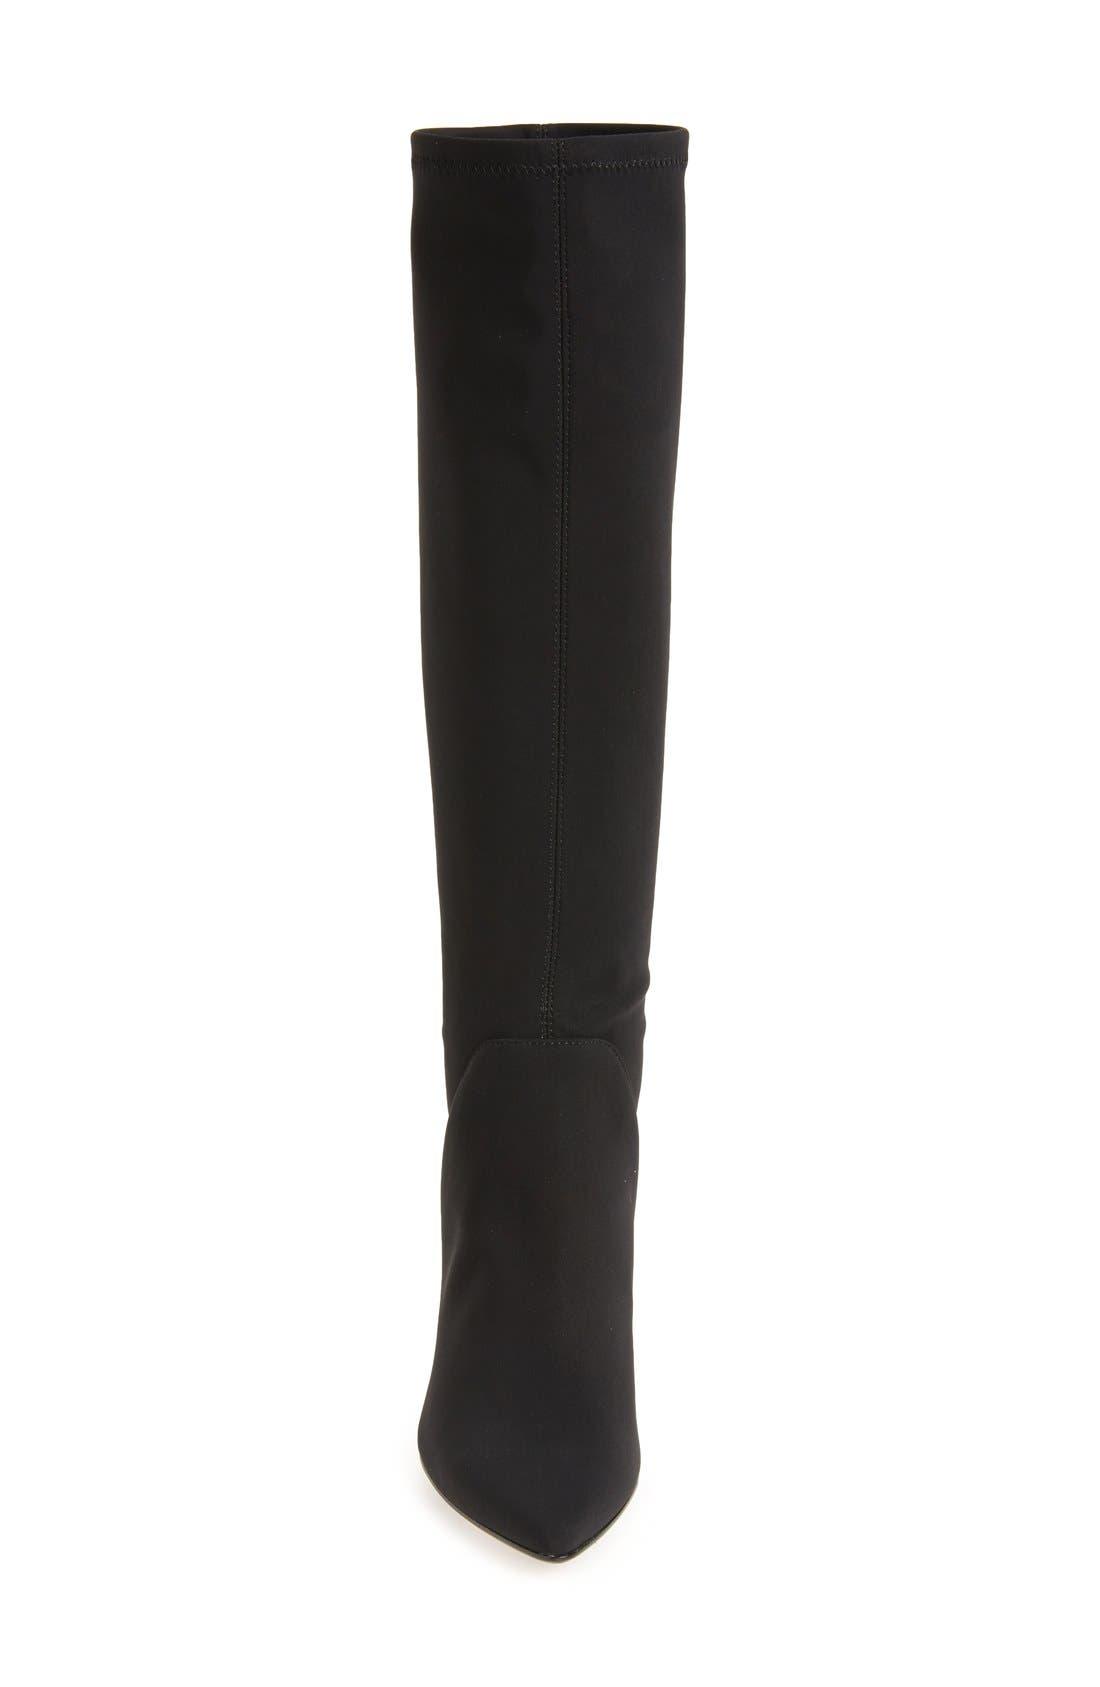 Alternate Image 3  - Donald J Pliner 'Tessa' Knee High Boot (Women)